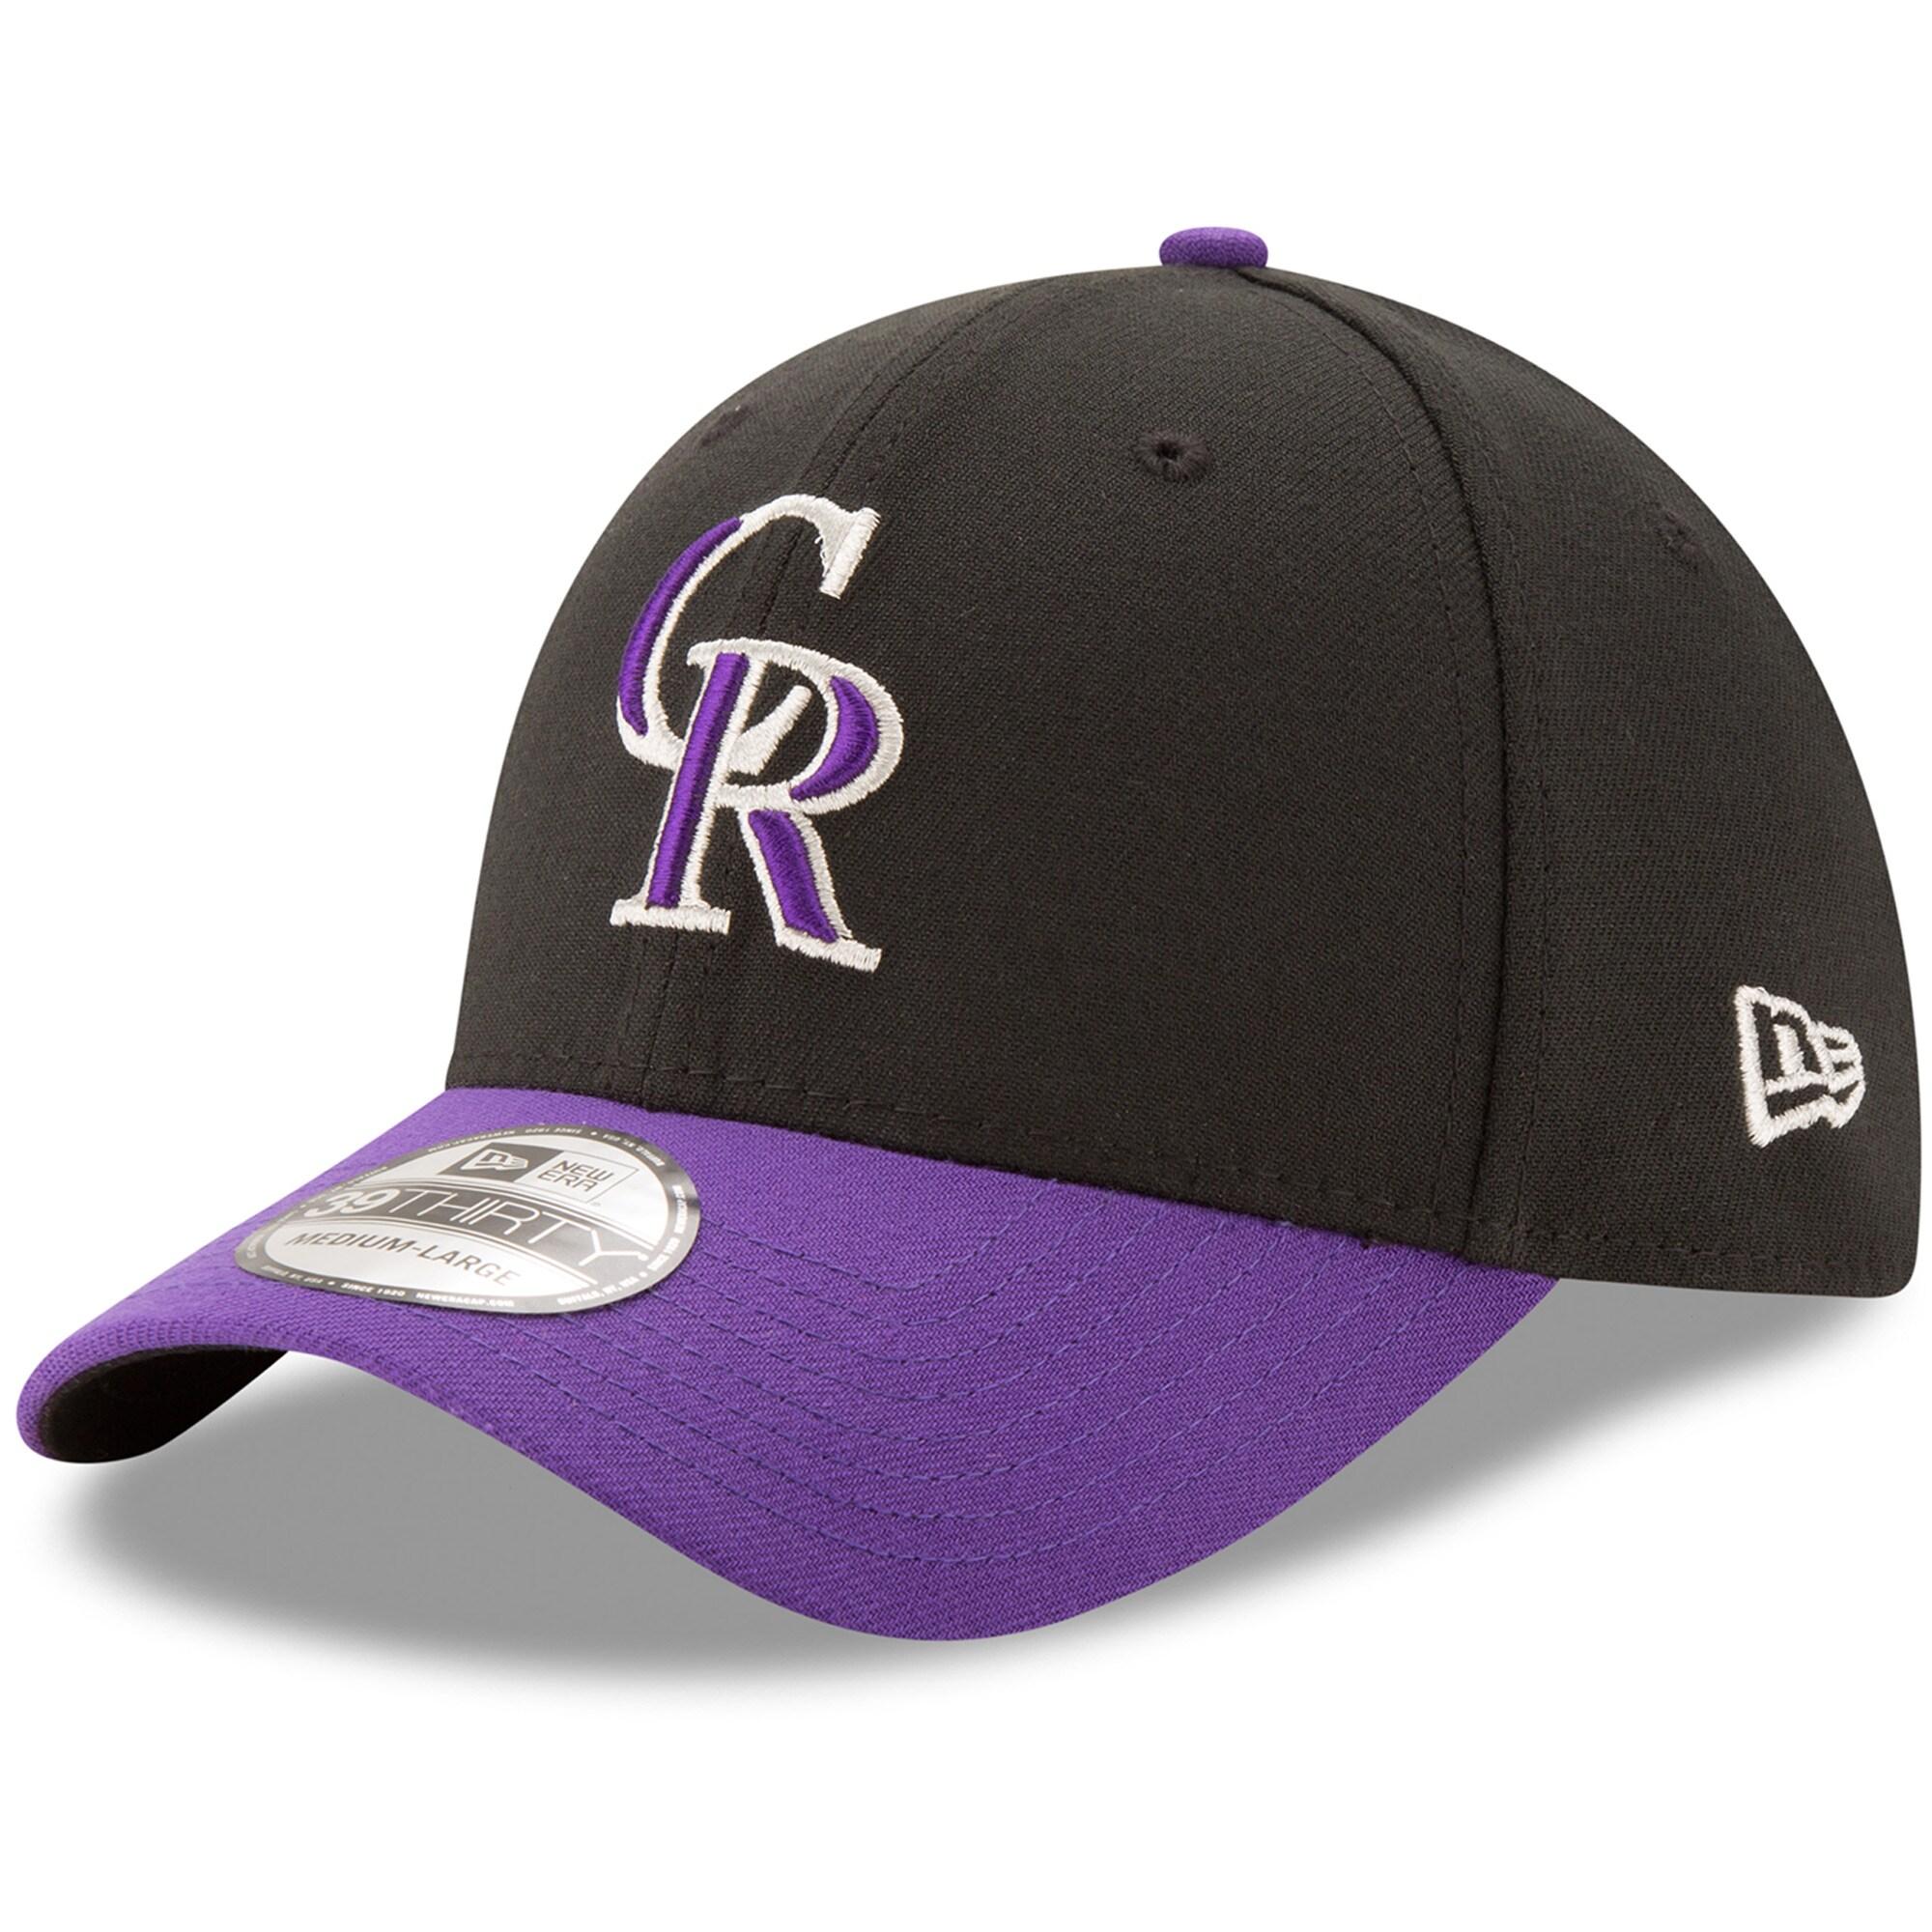 Colorado Rockies New Era Alternate Team Classic 39THIRTY Flex Hat - Black/Purple